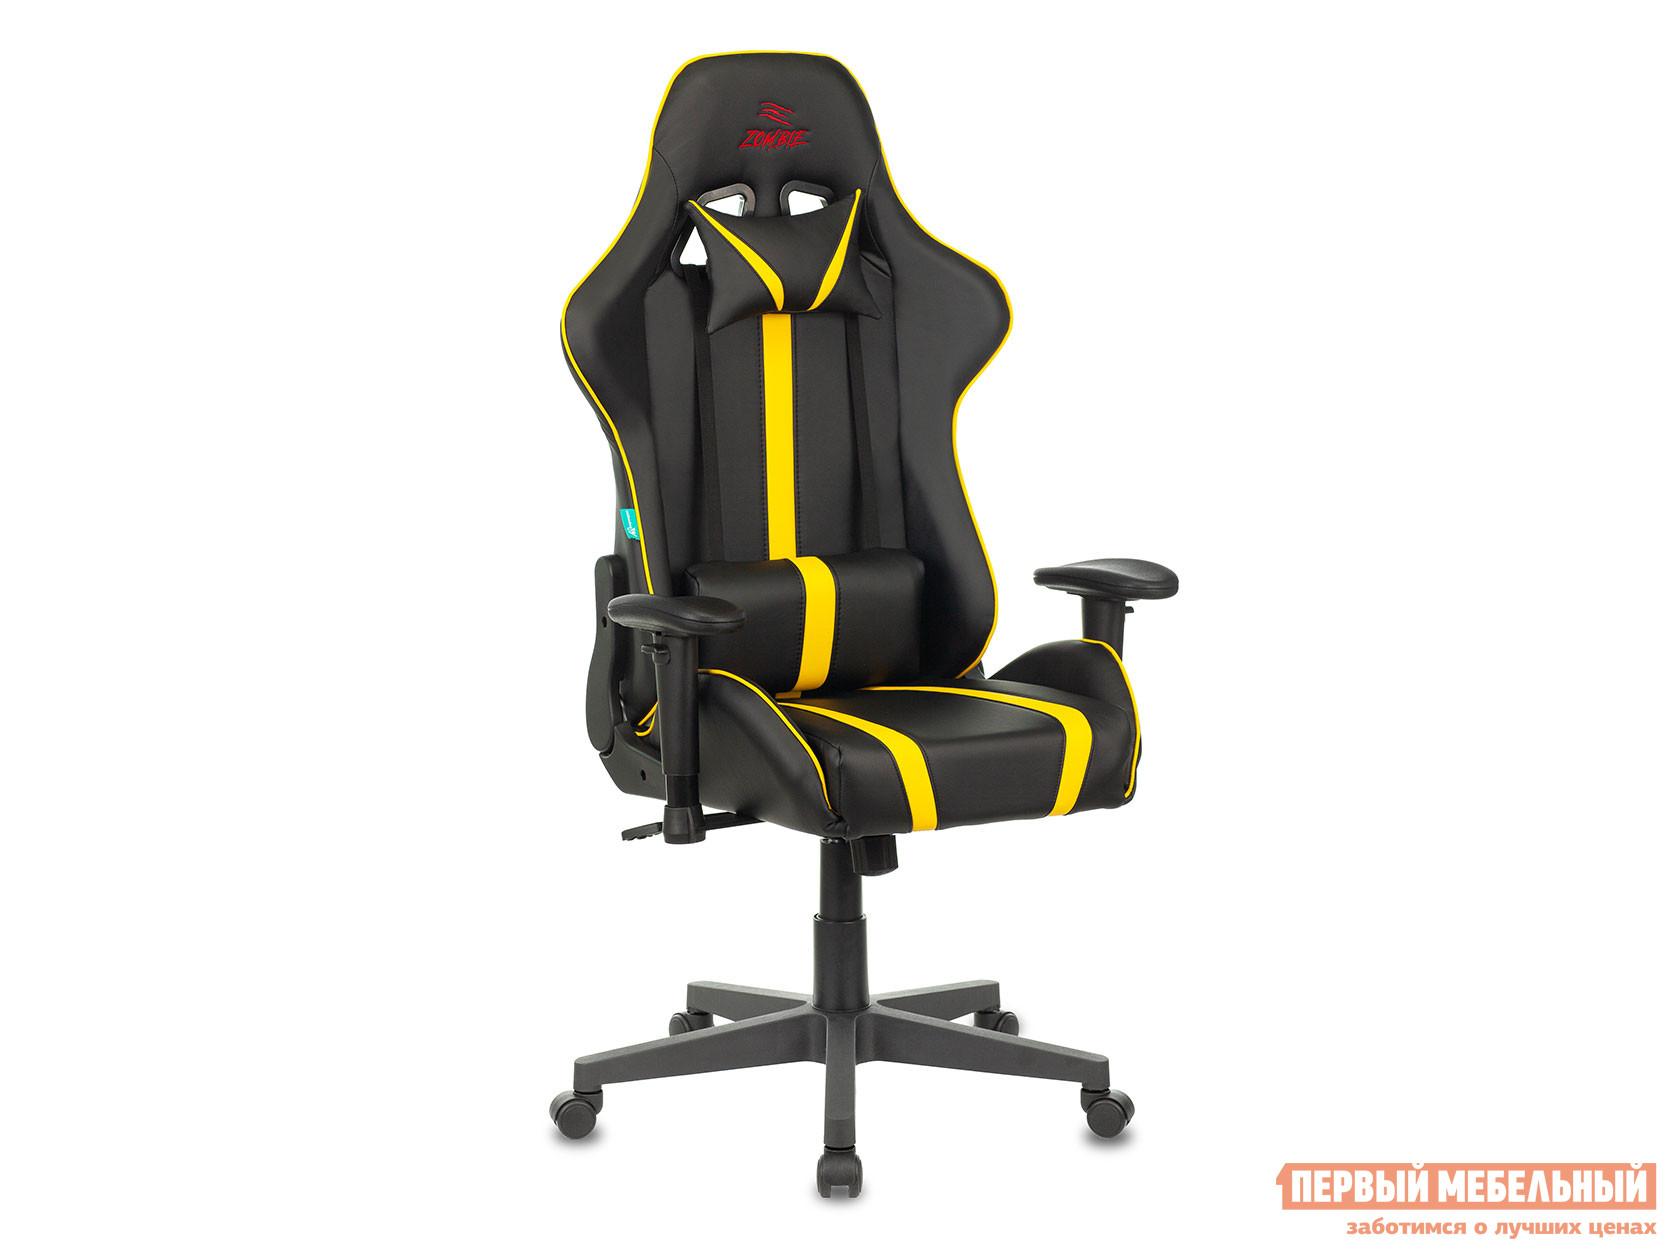 Игровое кресло Бюрократ Кресло игровое Бюрократ VIKING ZOMBIE A4 кресло игровое dxracer dxracer drifting oh dj133 n